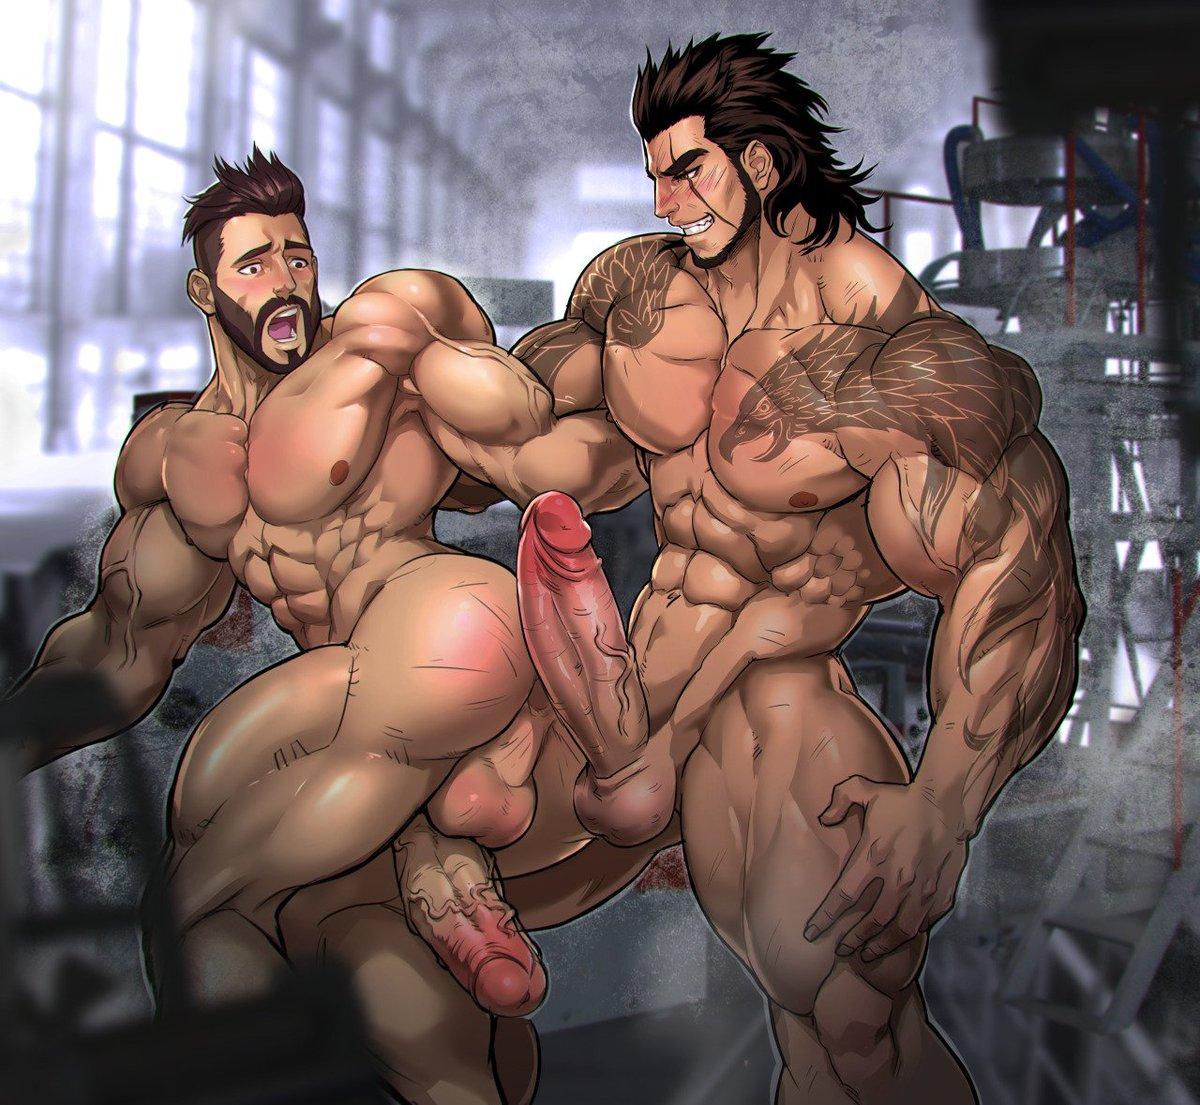 Gay bara swimmers porn